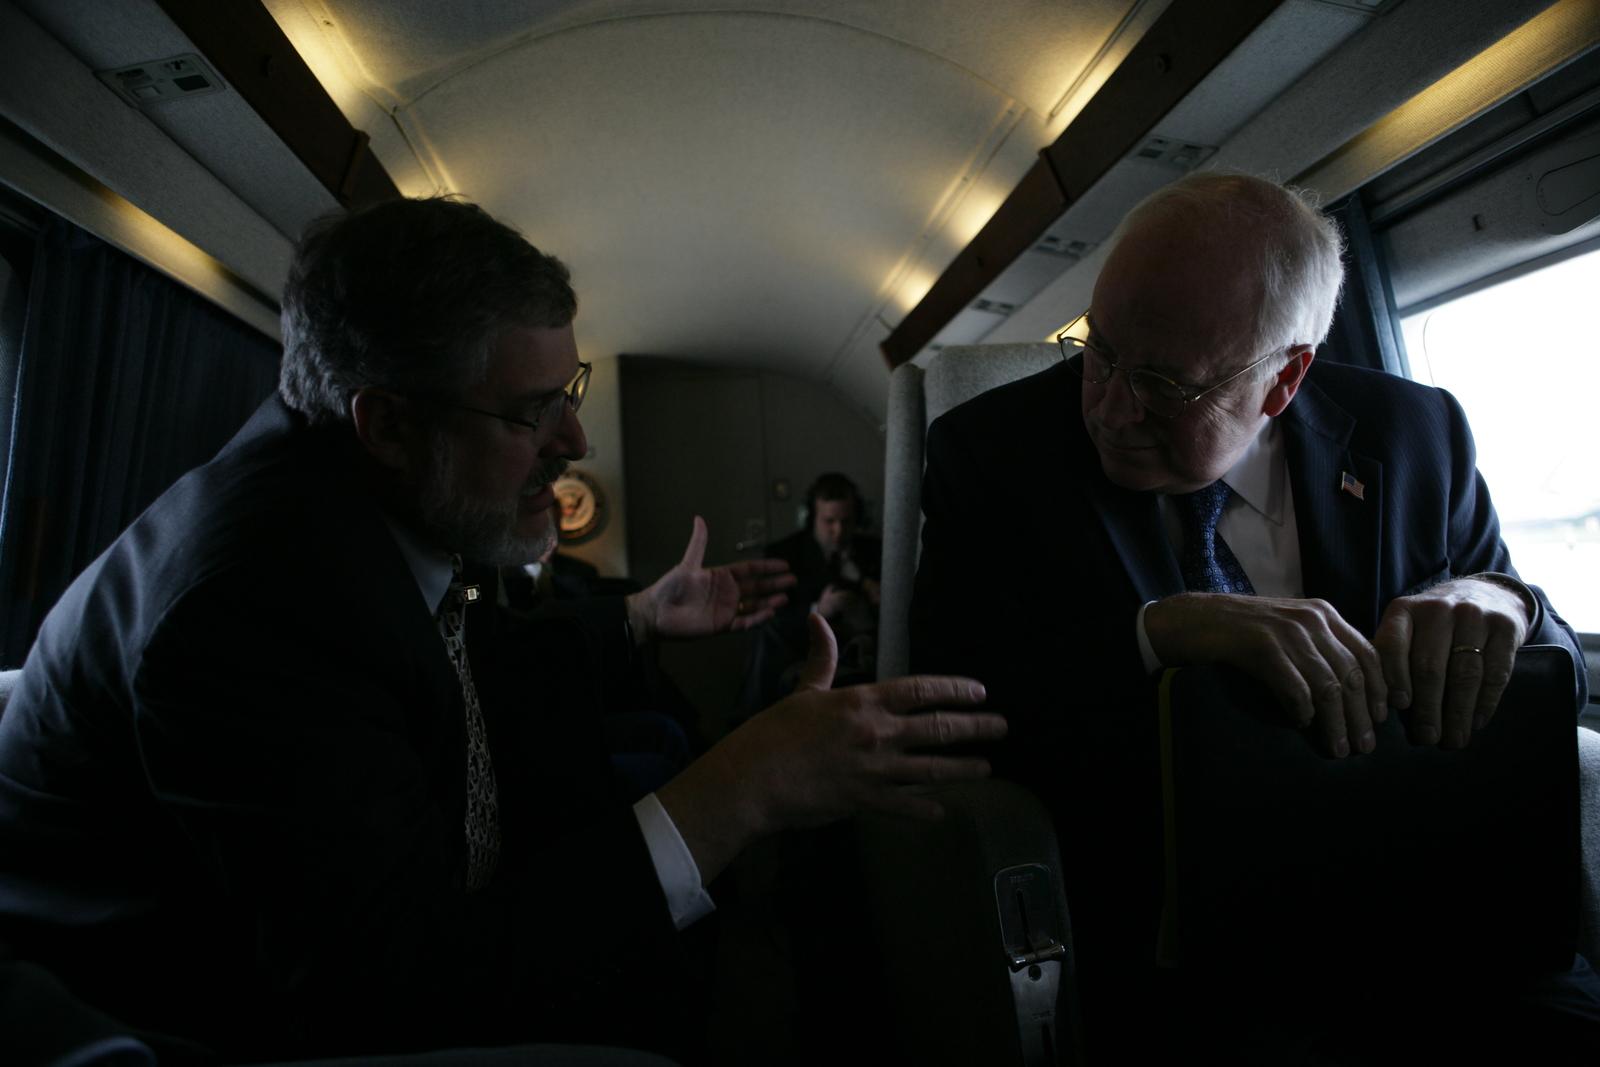 Vice President Cheney Talks with David Addington Aboard Marine Two